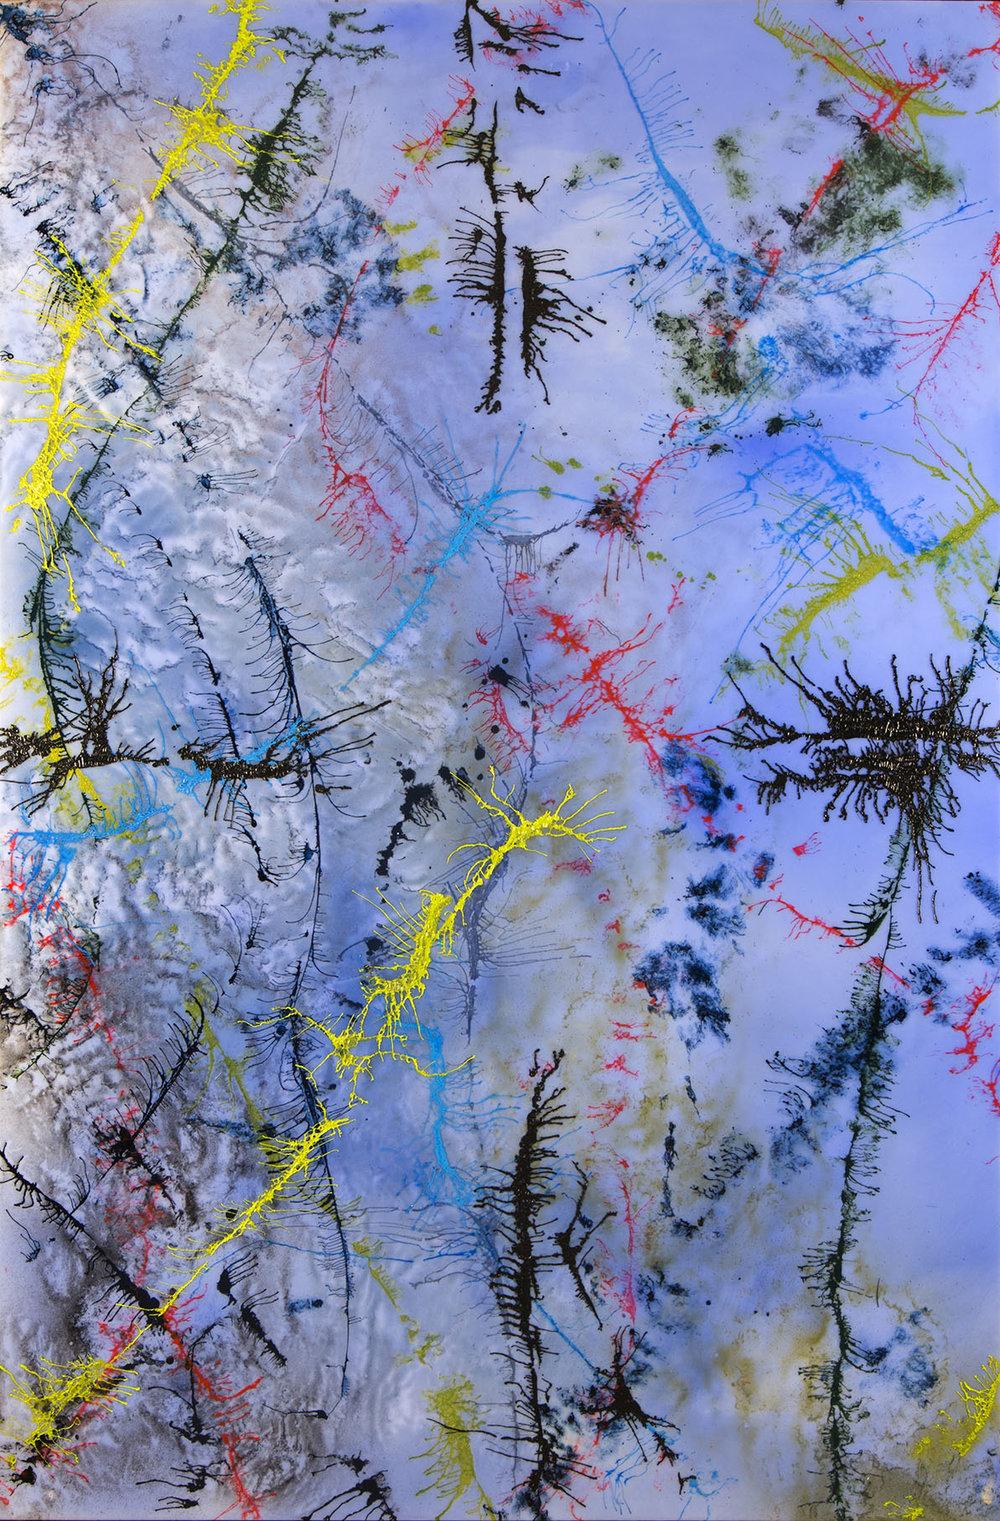 Warren, Cellular Current, Low Res.jpg